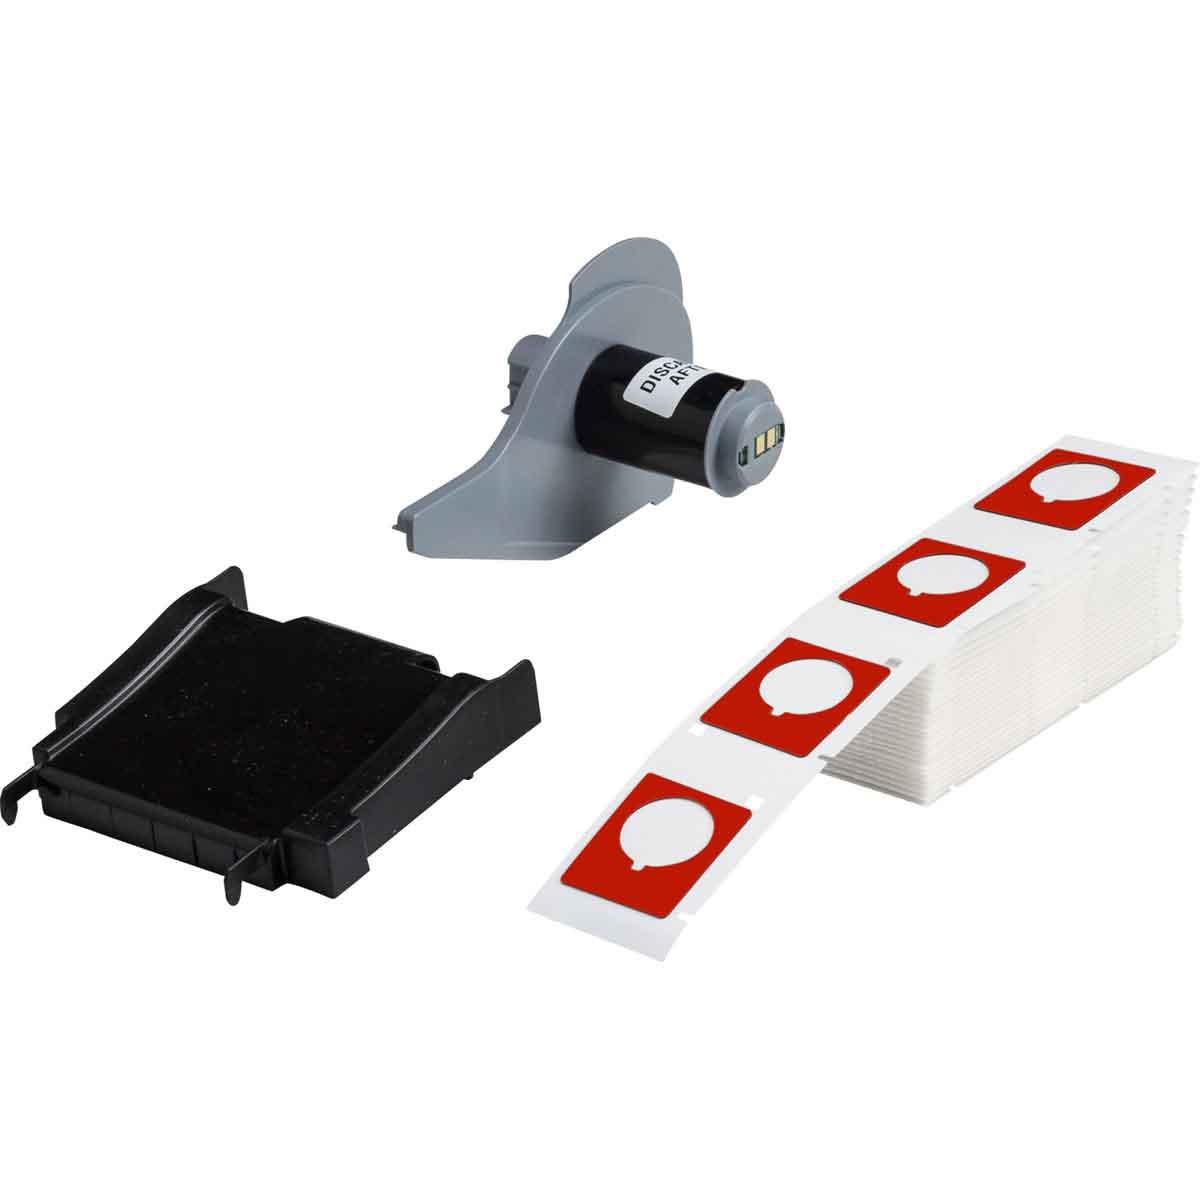 Brady Part M71ep 167 593 Rd 115044 71 Foam Backed Raised Panel Mounted Push On Hazard Switch Labels